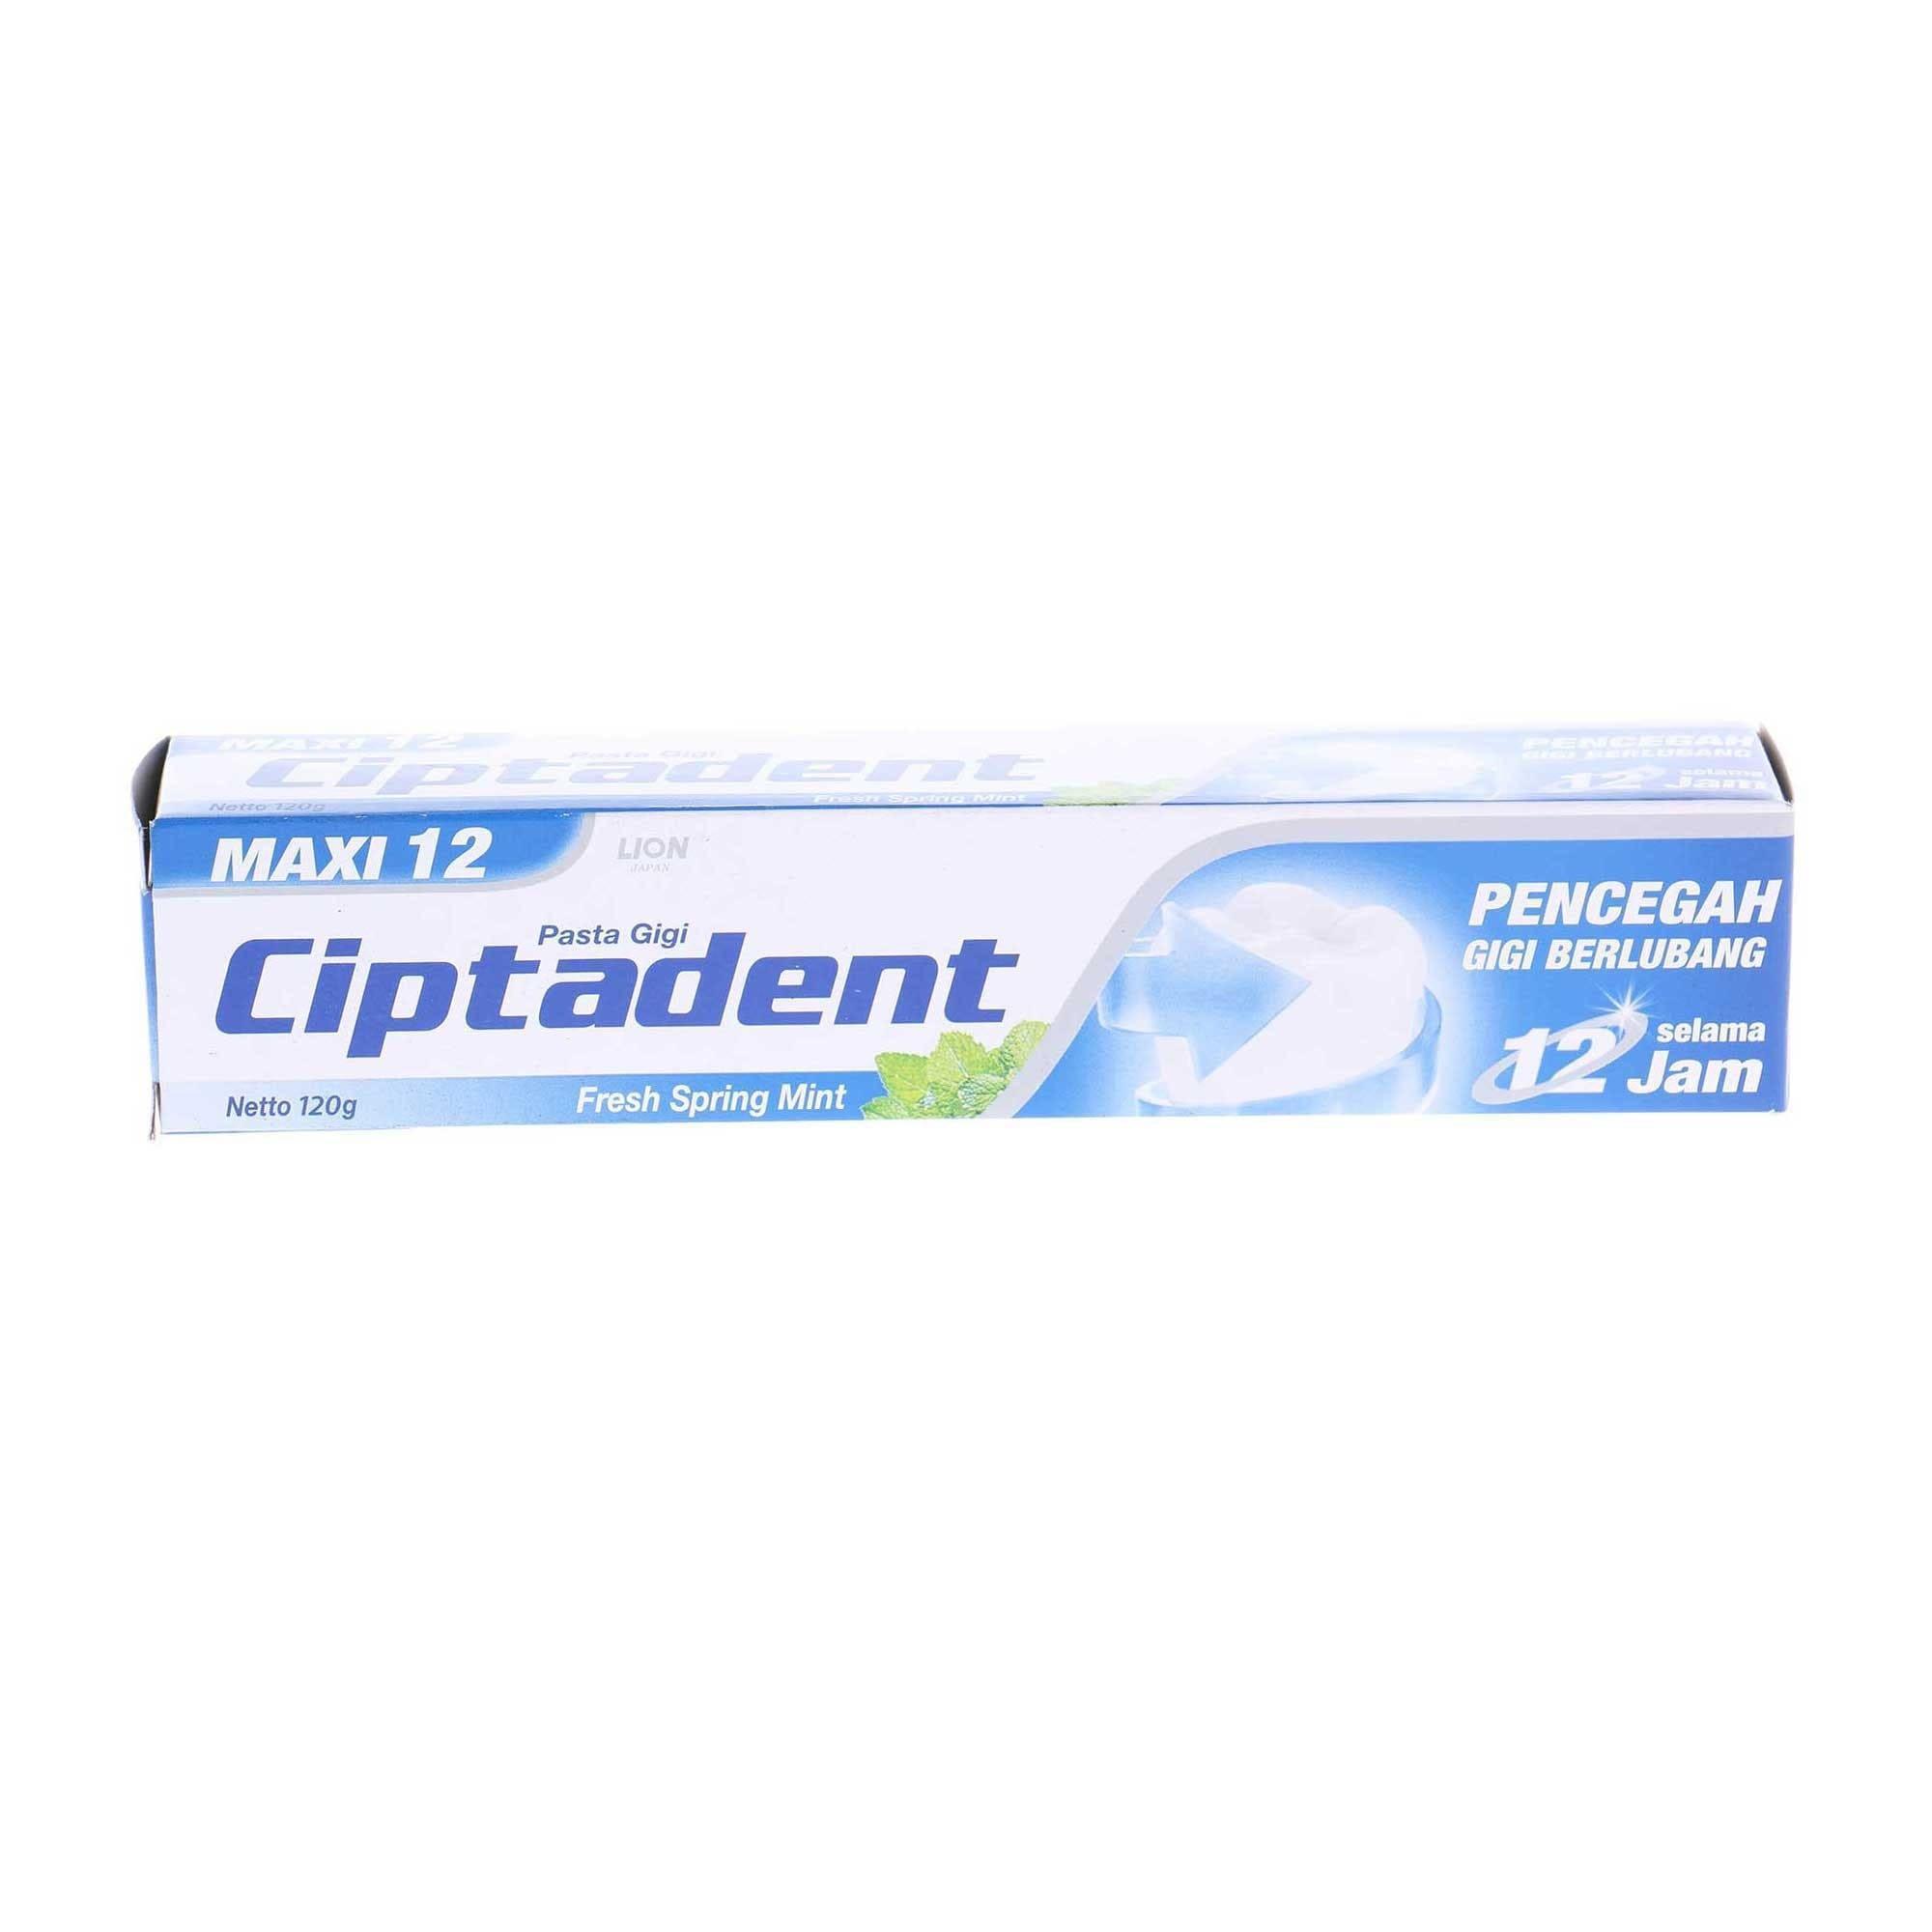 Pasta Gigi Ciptadent Maxi 12 Plus Cool Mint 120g Produk Terbaik Colgate Cavity Protection Fresh 180g 4 Pcs Spring